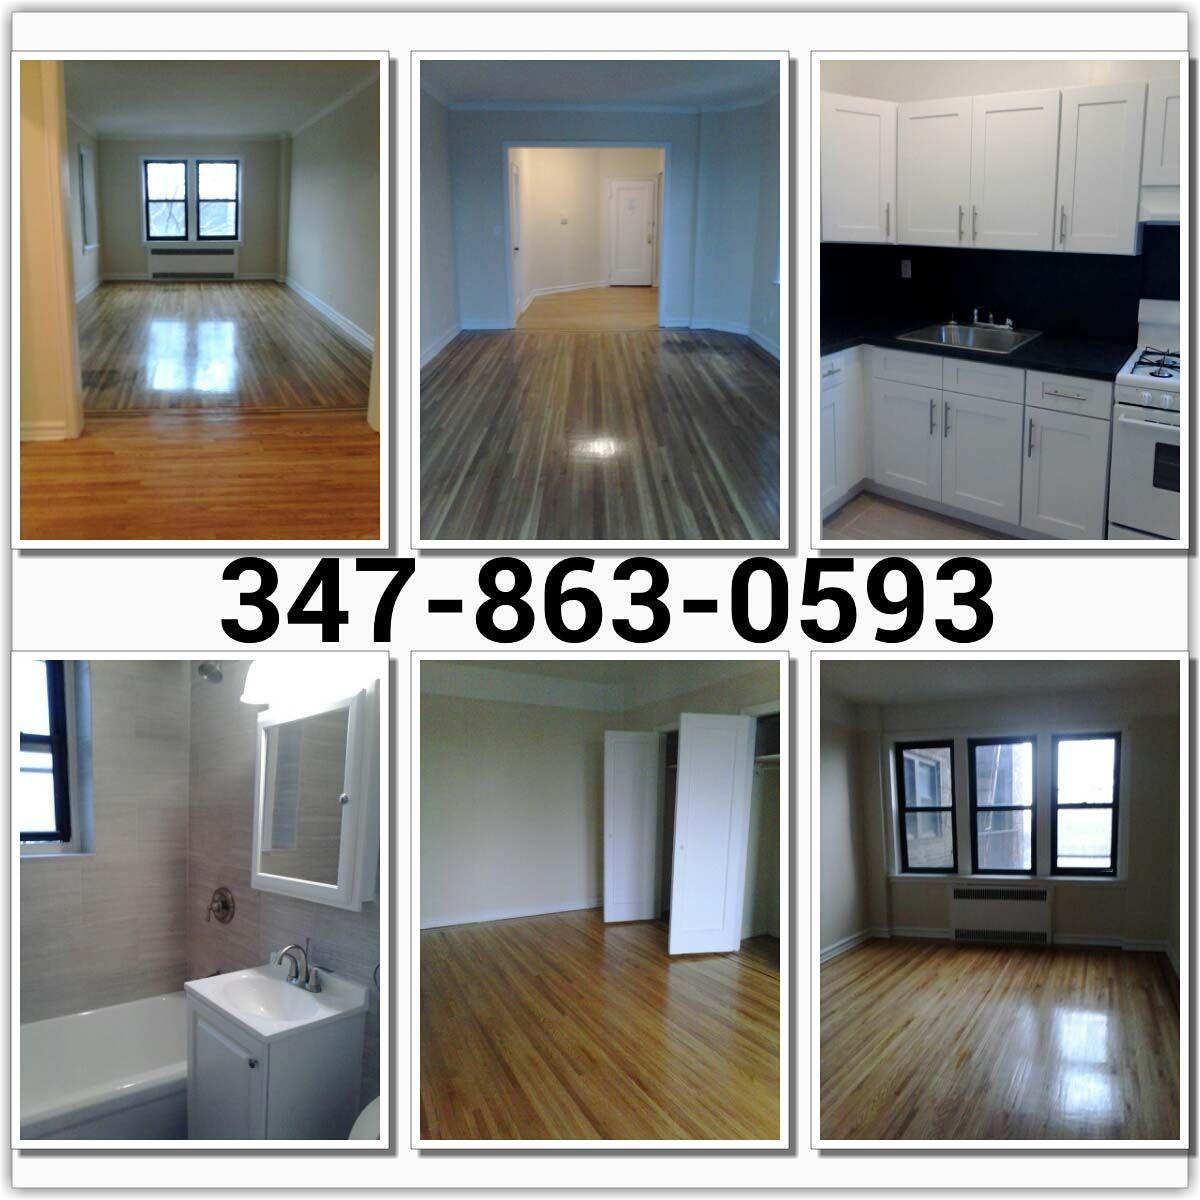 1700 1 bedroom apartment in jackson heights, queens nyc